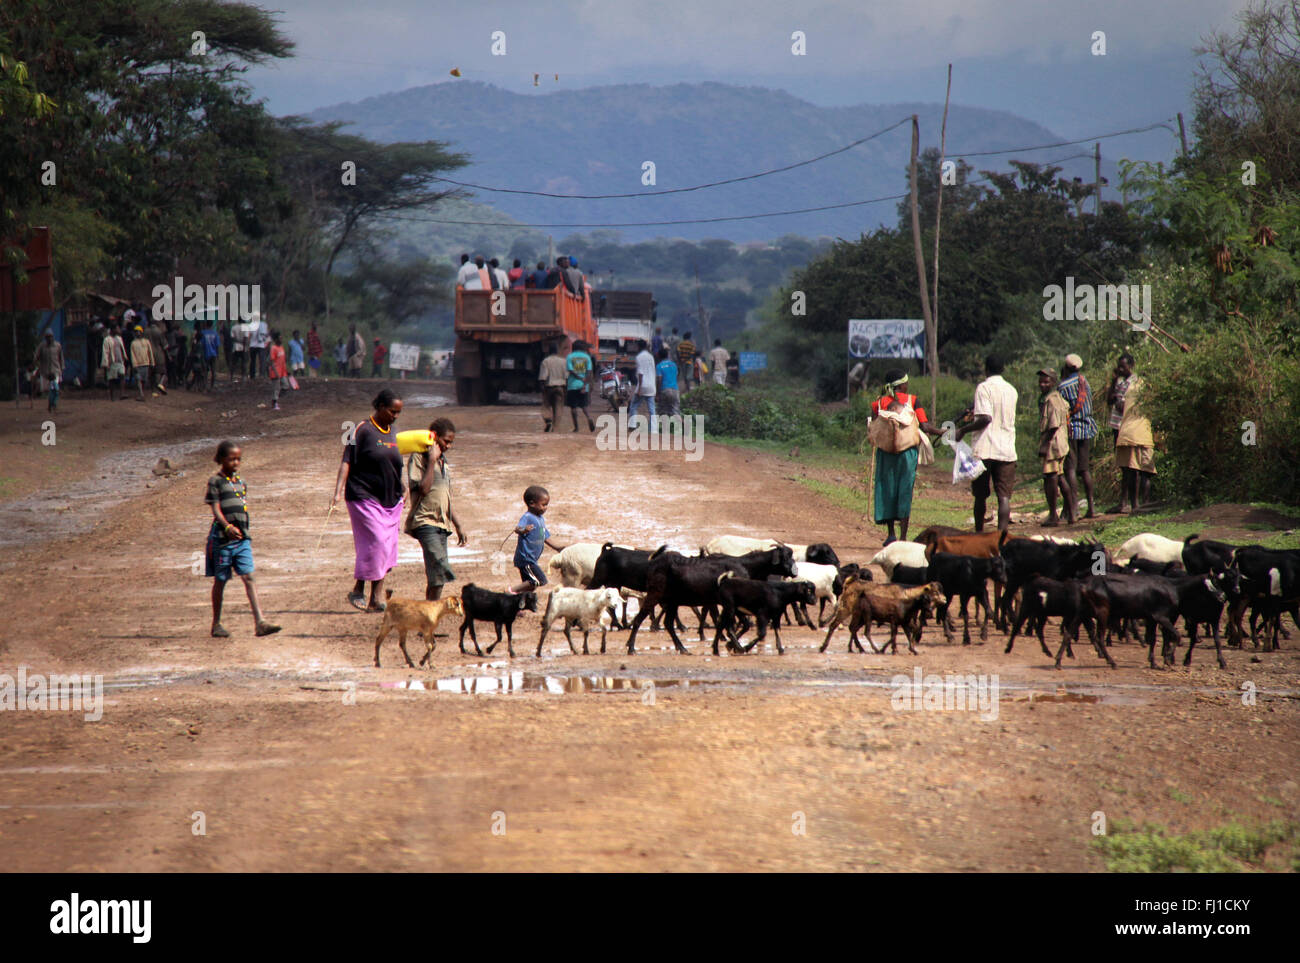 Landscape near Turmi village in Ethiopia - people crossing road with cattle - Stock Image